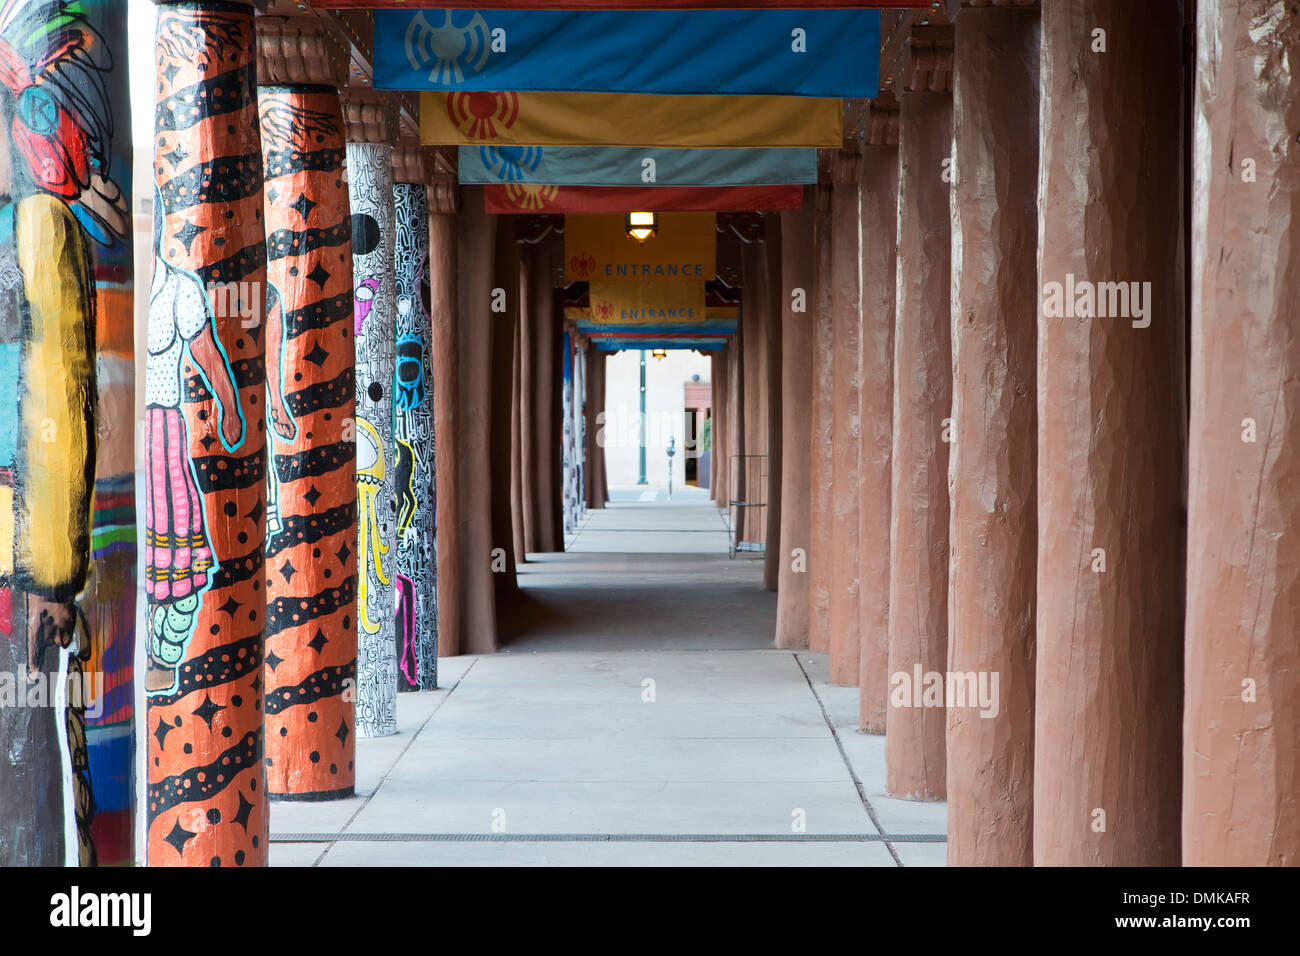 Verzierte Pfosten, Portal des Museum of Contemporary Native Arts, Santa Fe, New Mexico, Vereinigte Staaten Stockbild